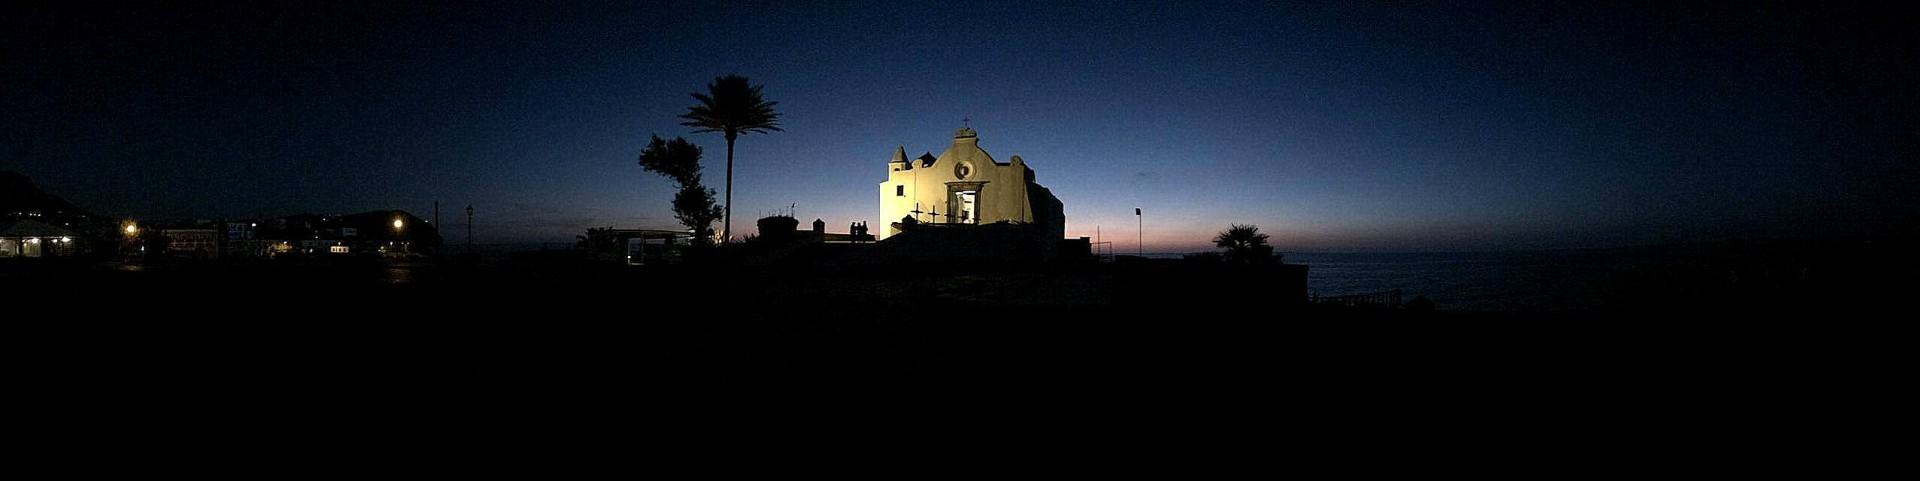 Forio, noční pohled na kostelík Santa Maria del Soccorso